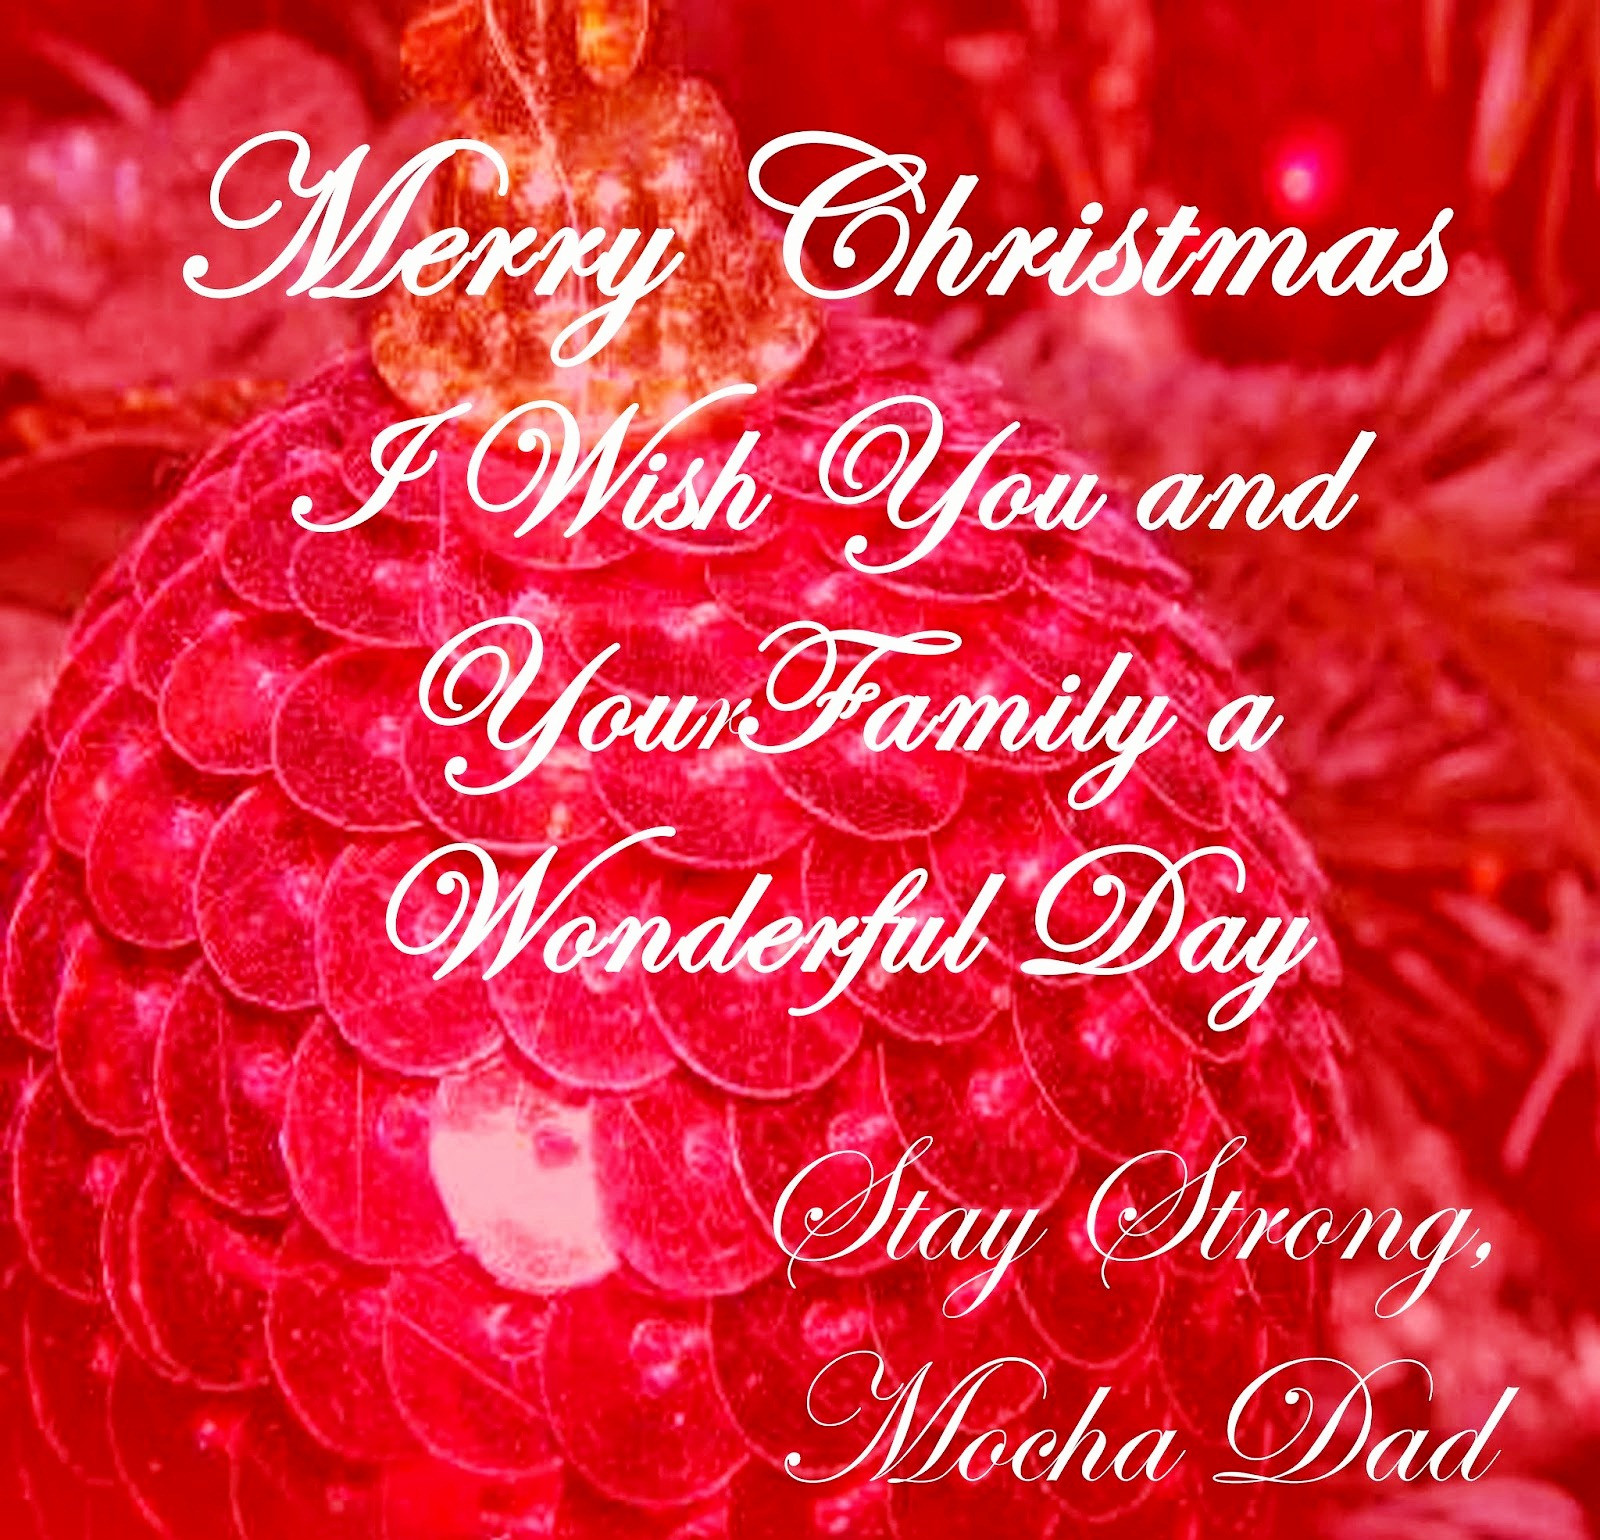 Merry Christmas Quotes  20 Merry Christmas Quotes 2014